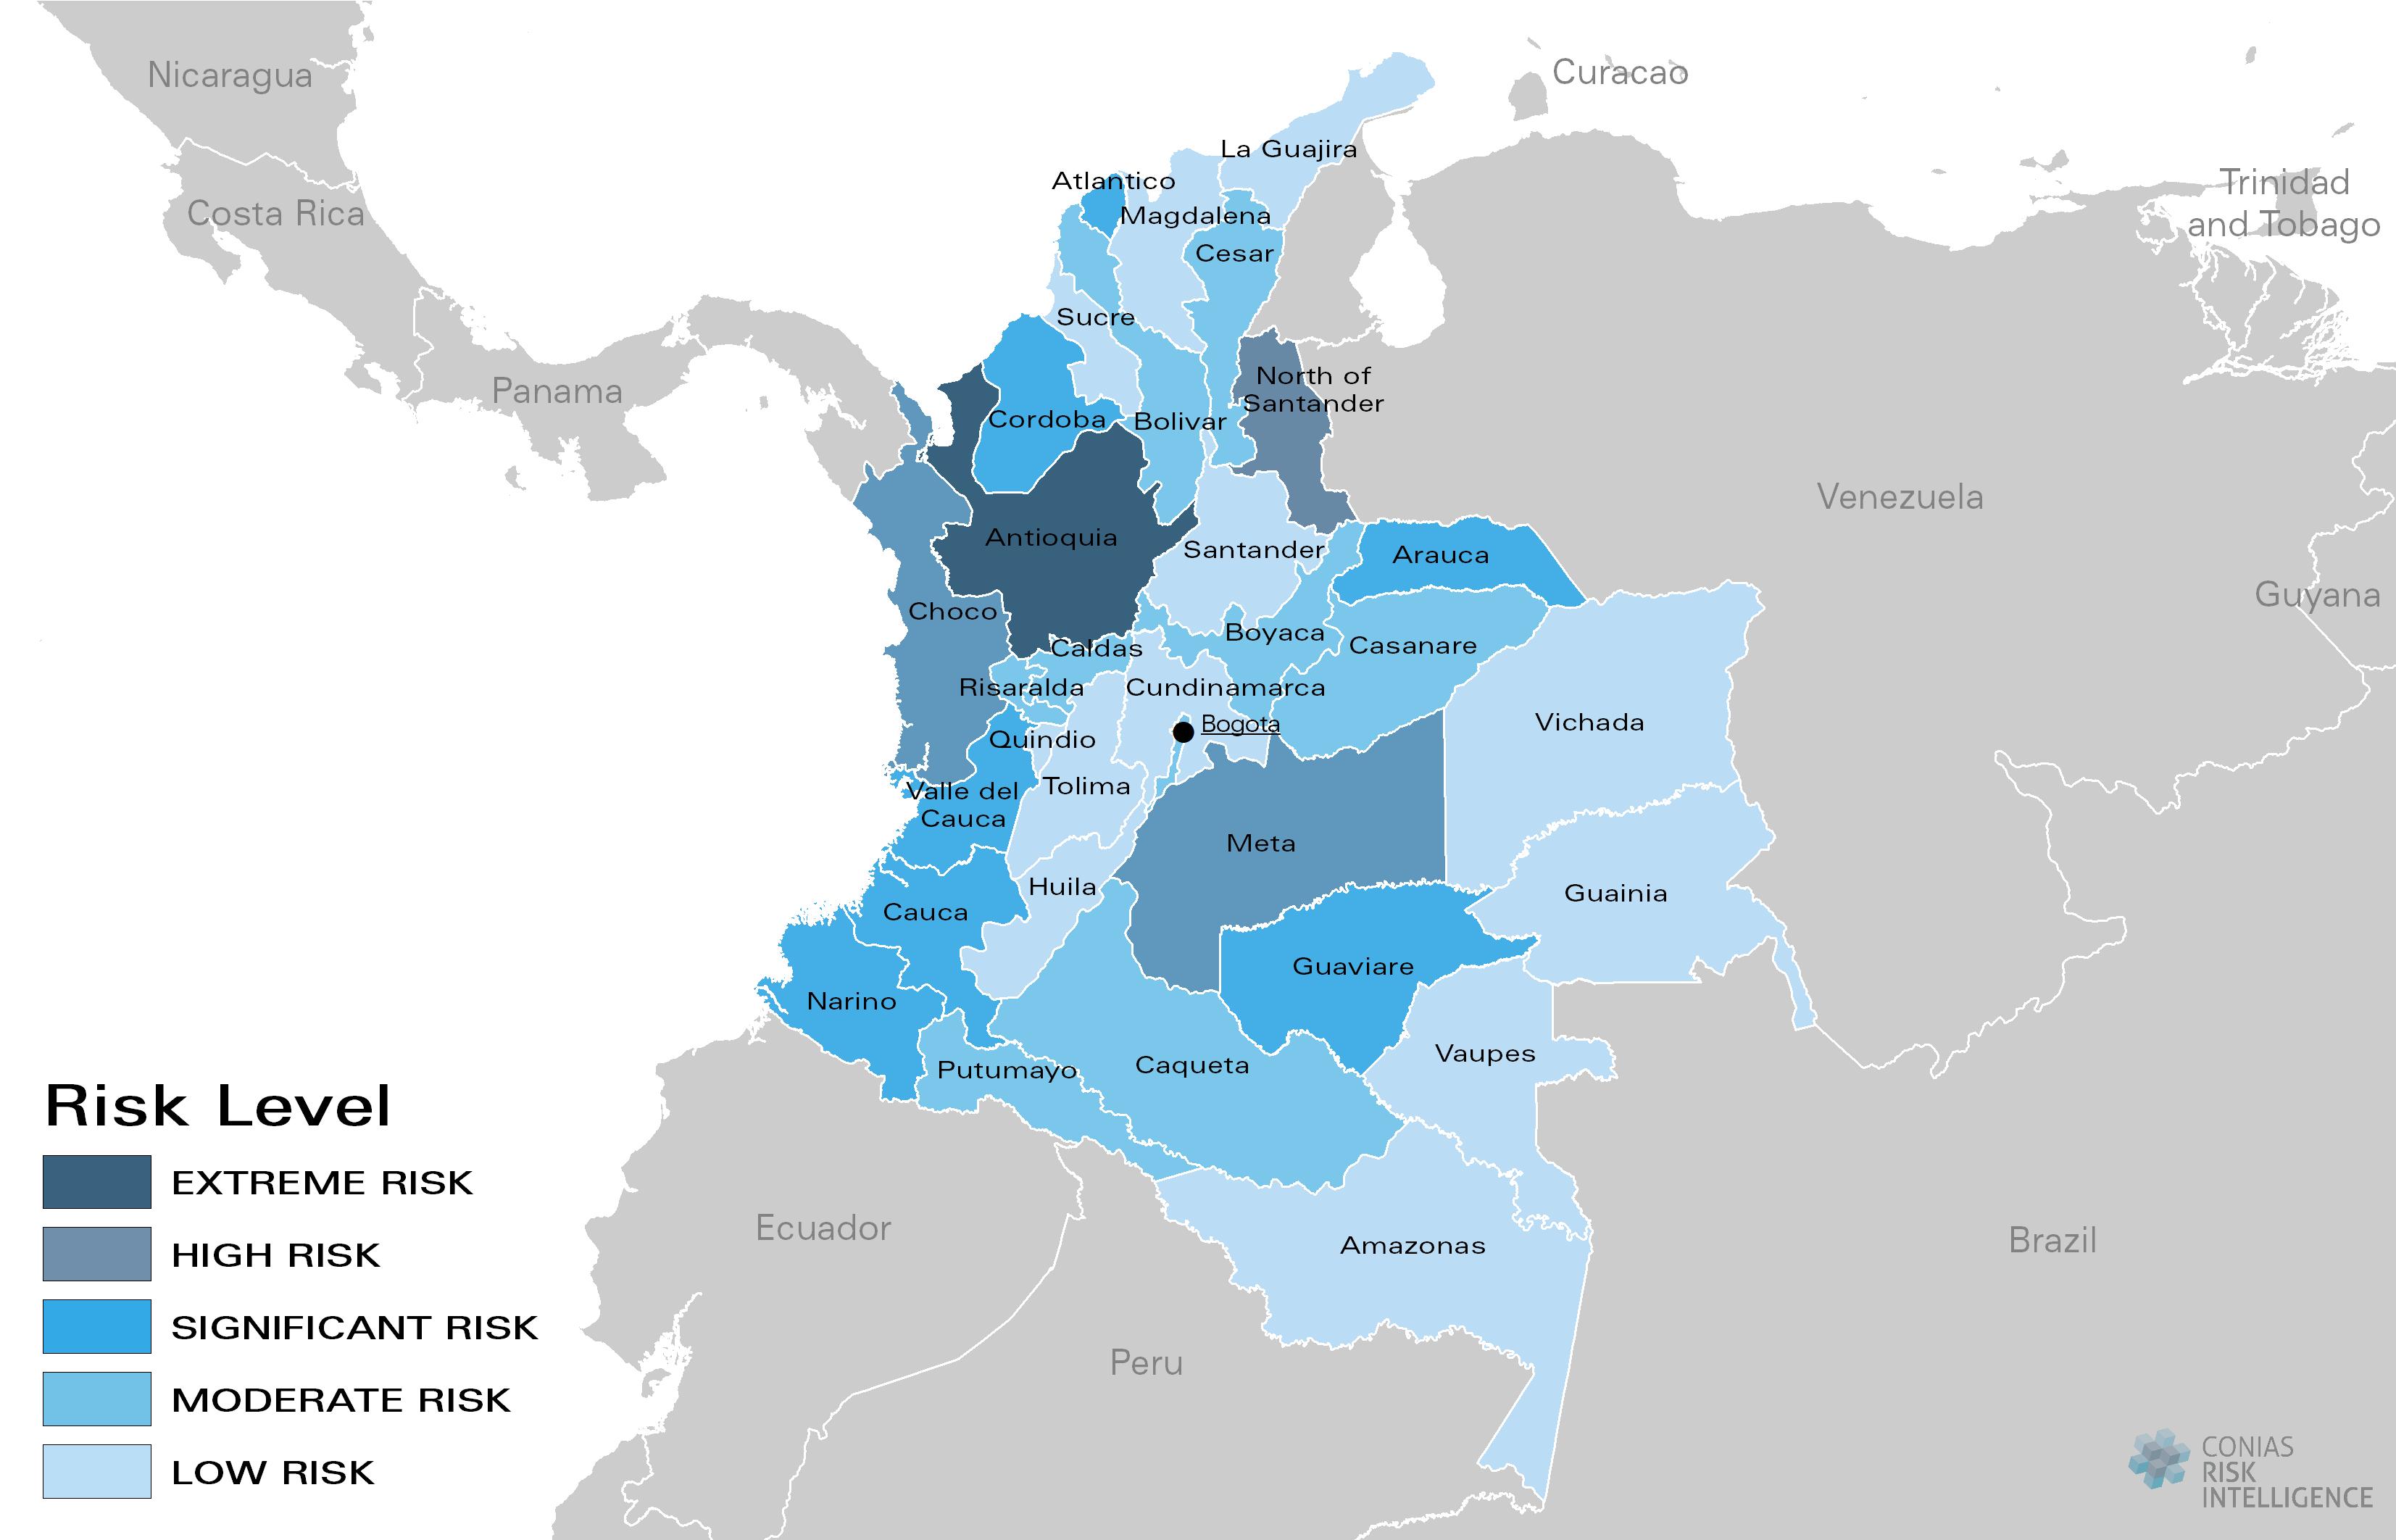 CONIAS Political Risk Maps Kolumbien